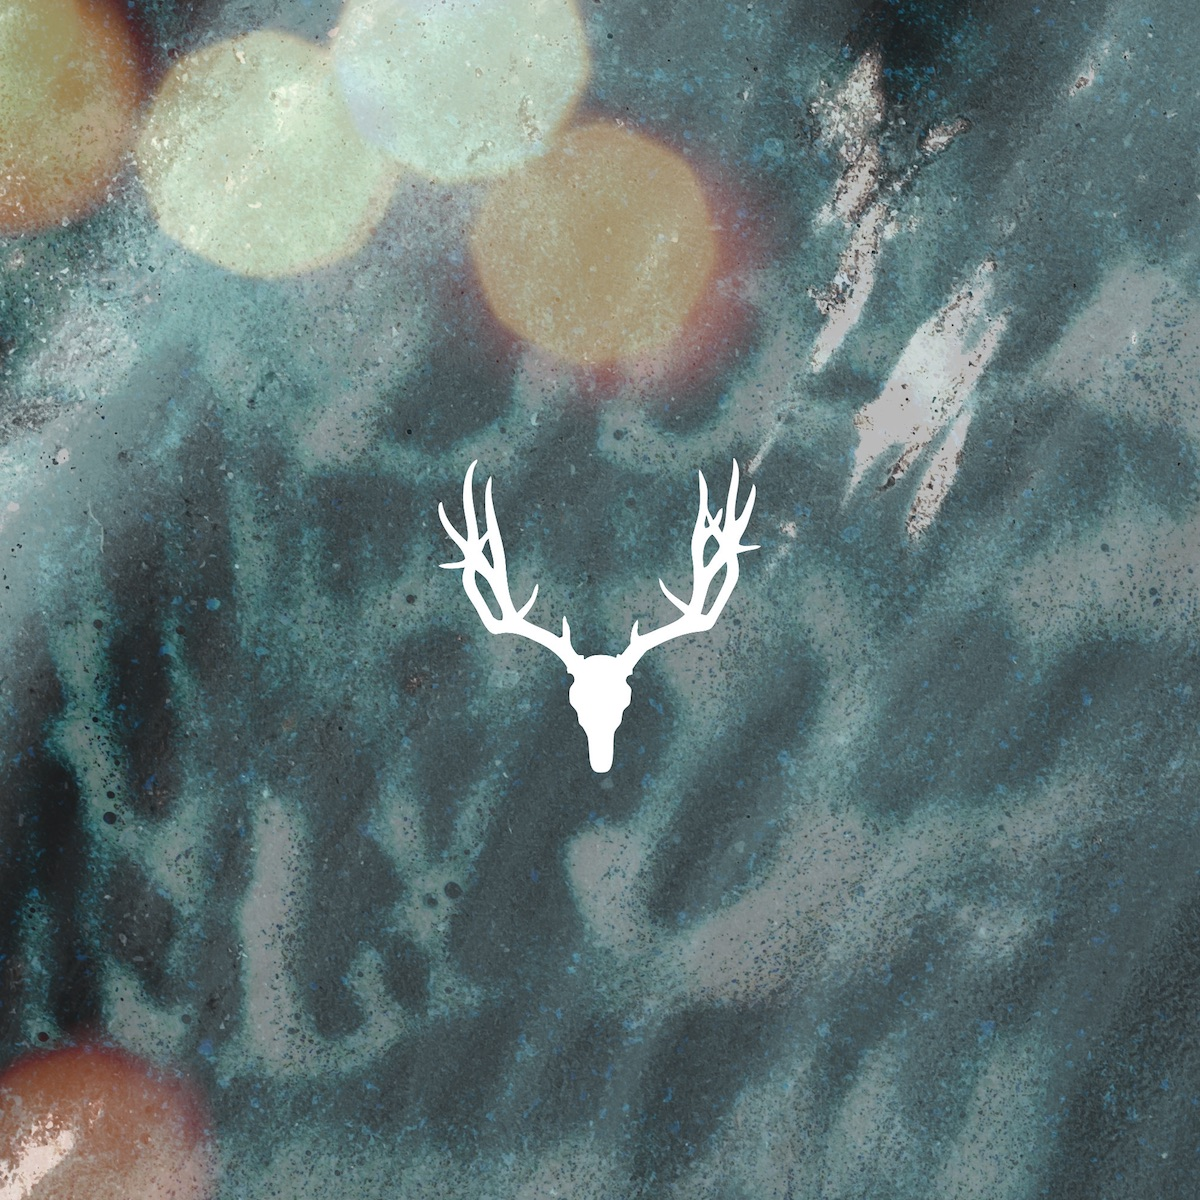 Cervidae Recordings - Five Years Compilation Vol.1 & Vol.2